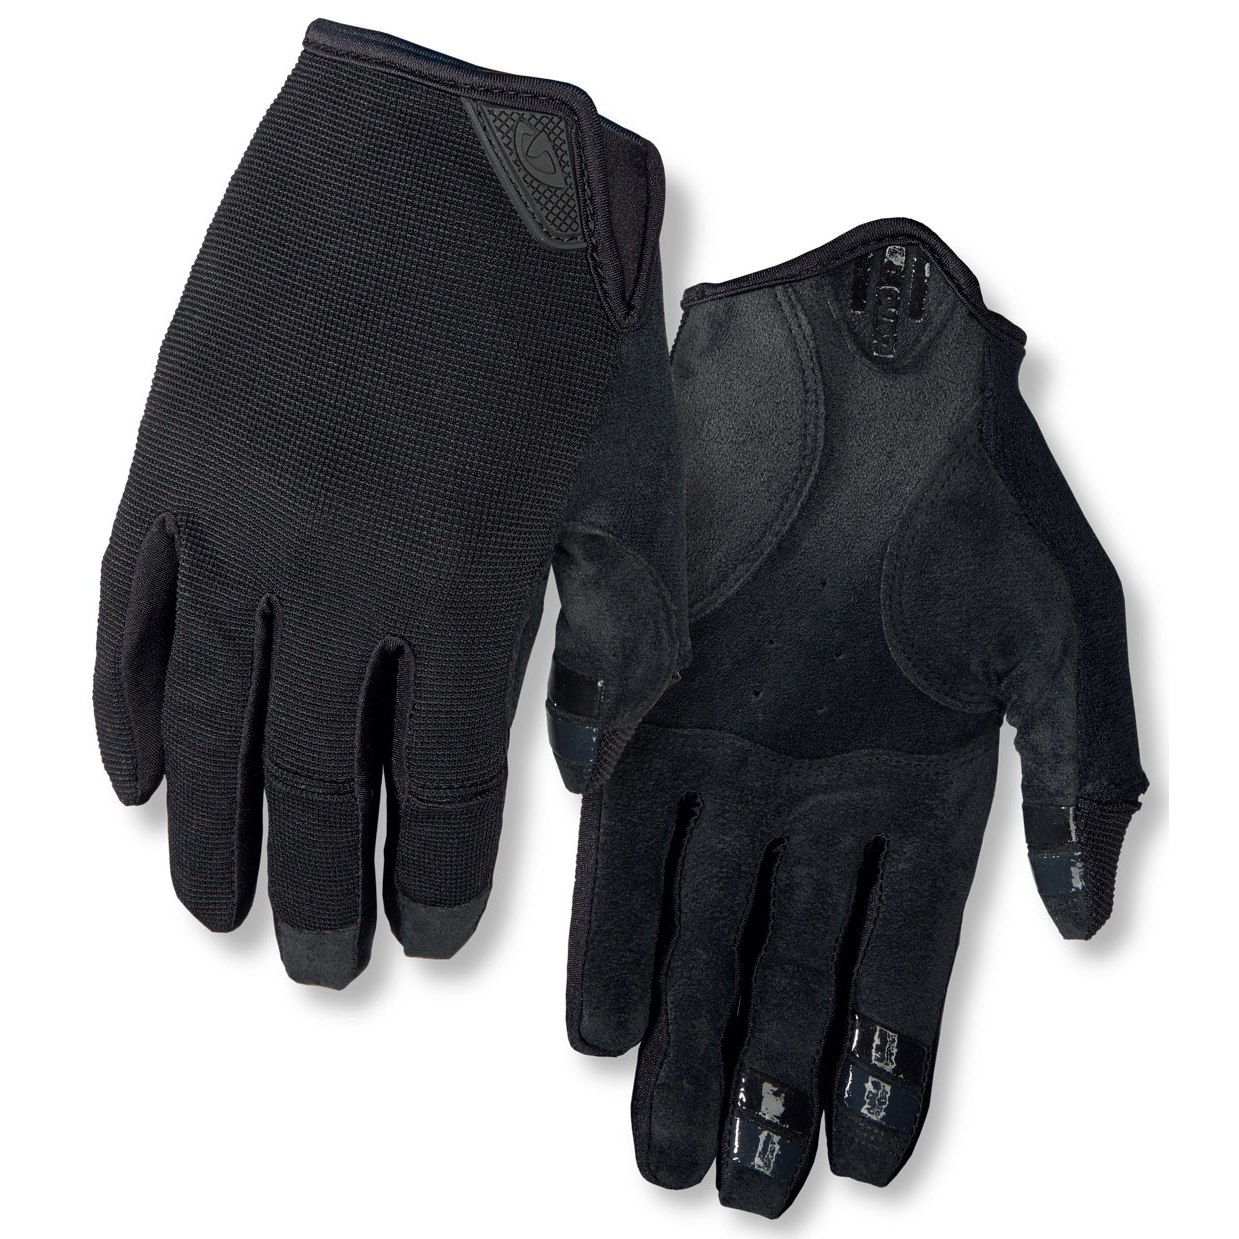 Giro DND Handschuhe - black 230050065